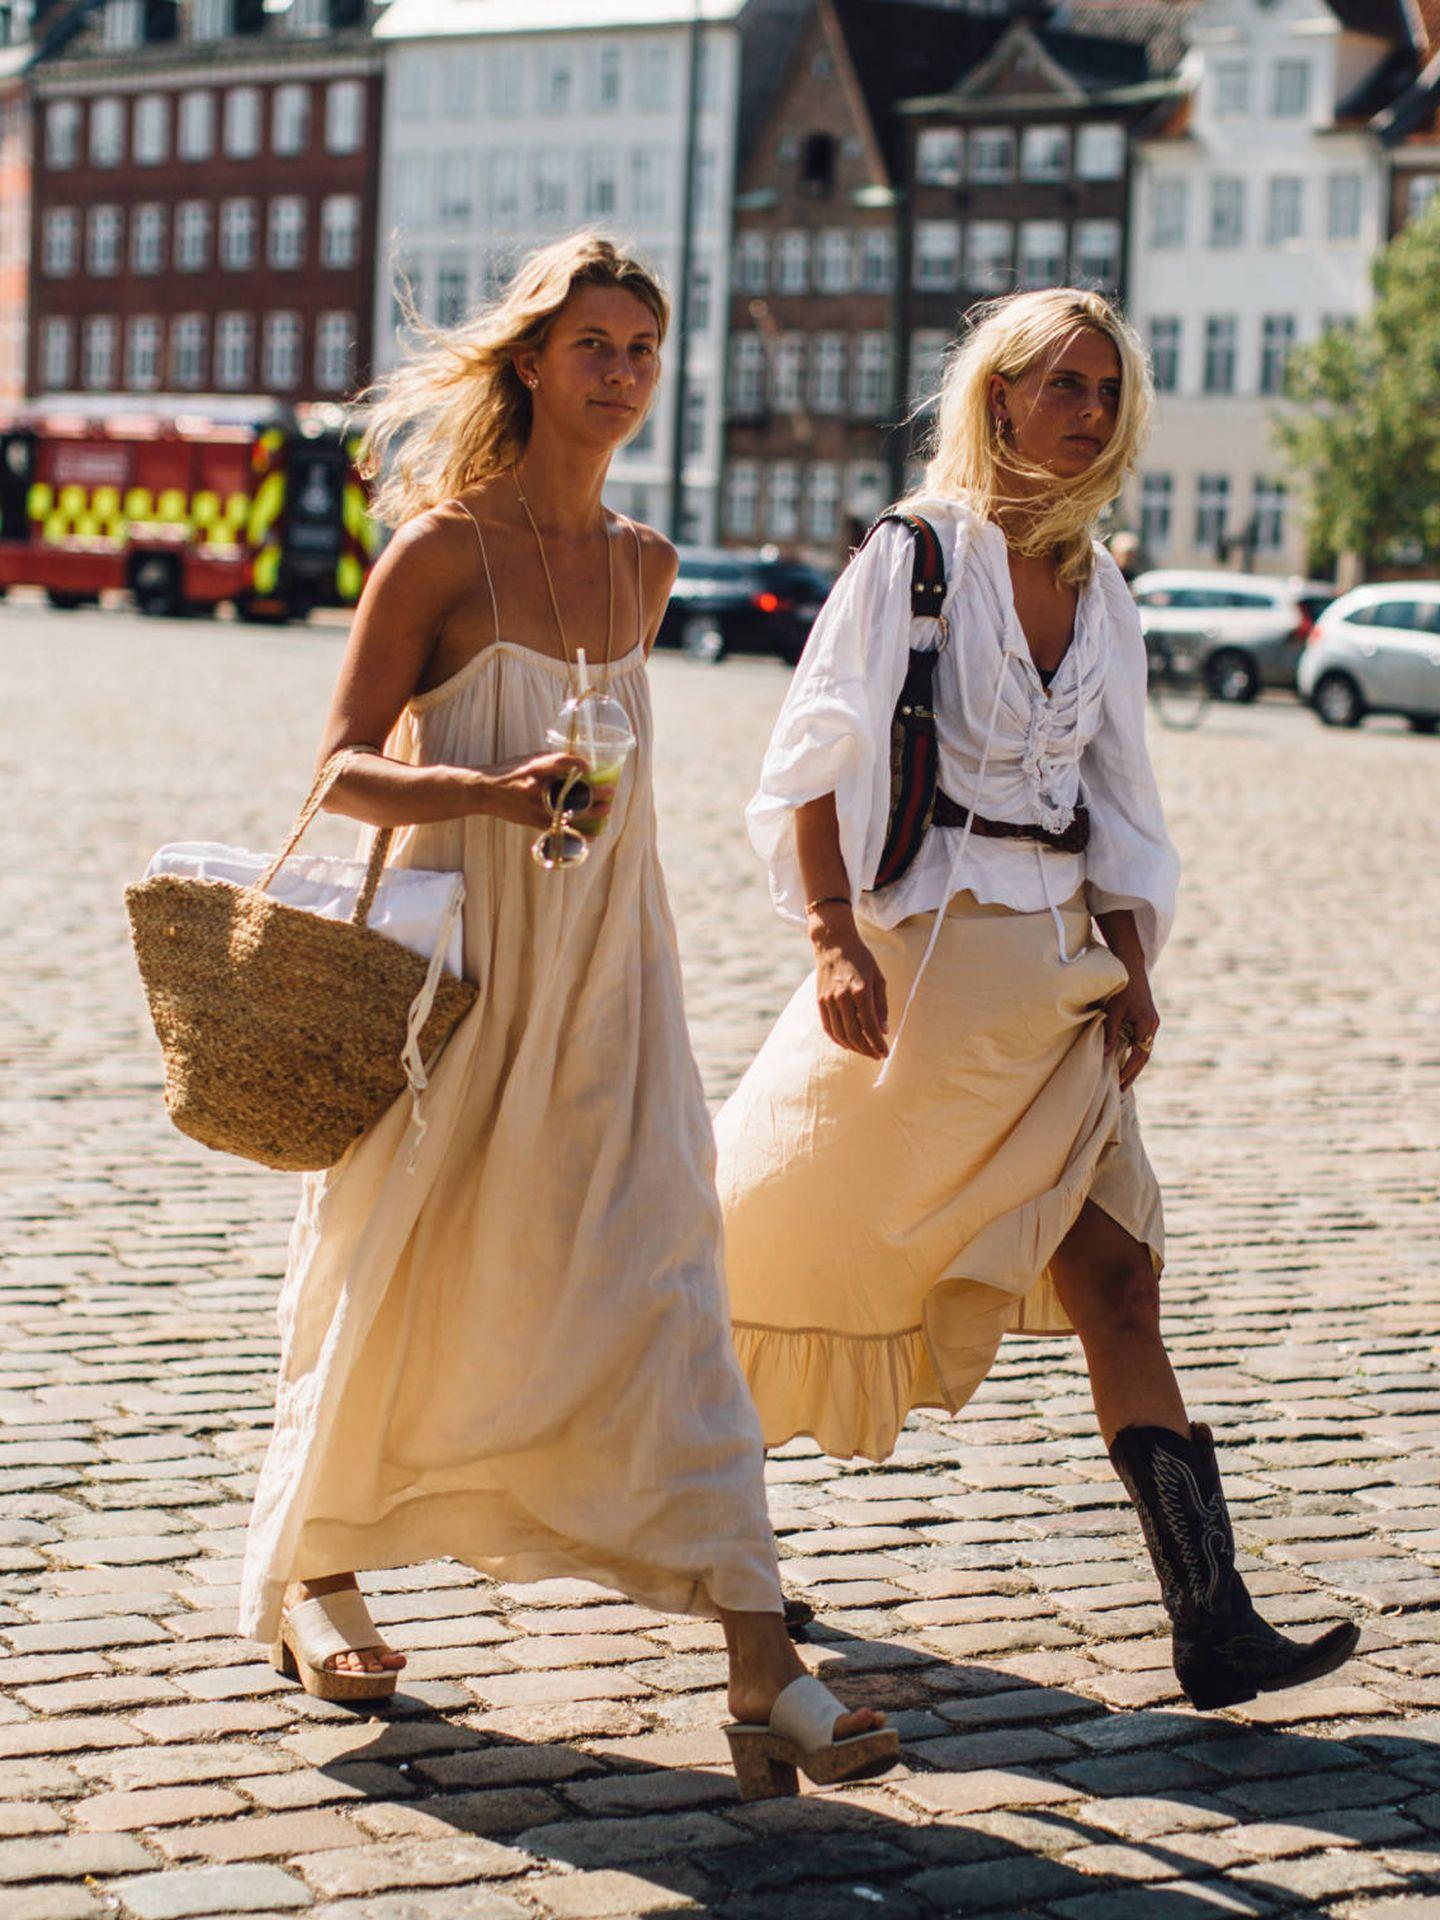 Una danesa con un capazo a modo de bolso urbano. (Imaxtree)